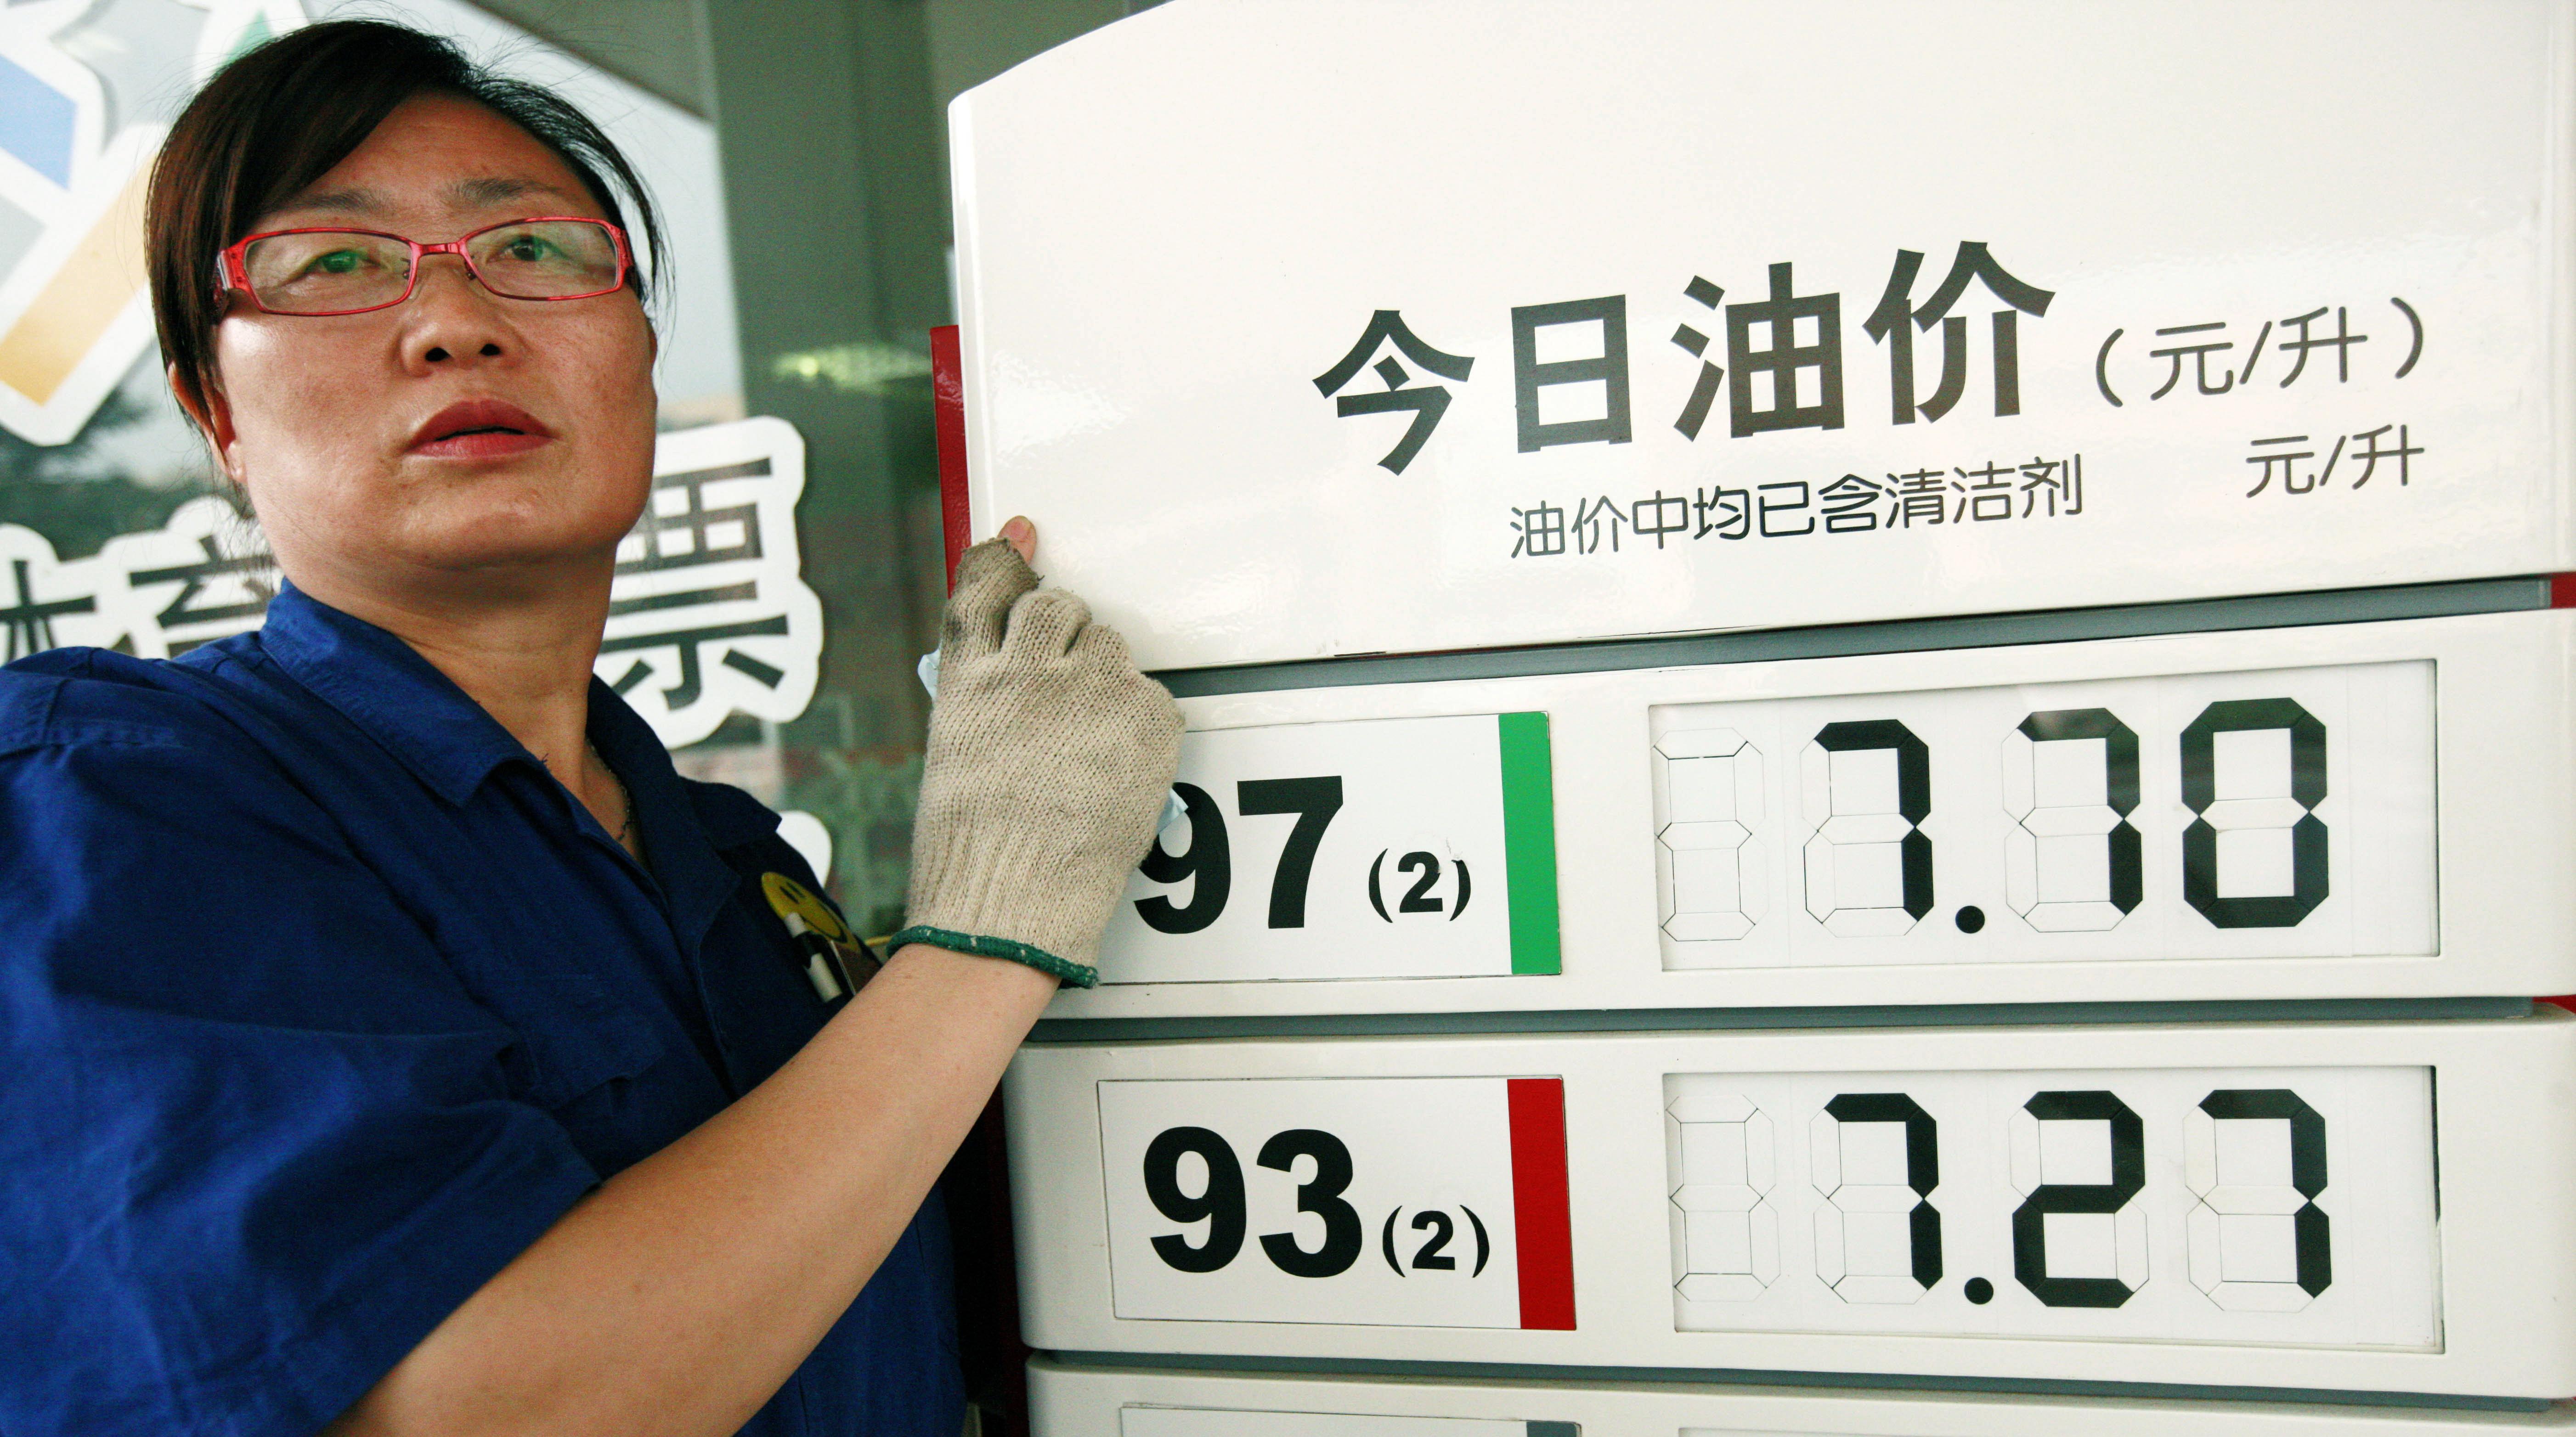 146091382 - Китай снизил цены на газ к минимуму с 2008 года